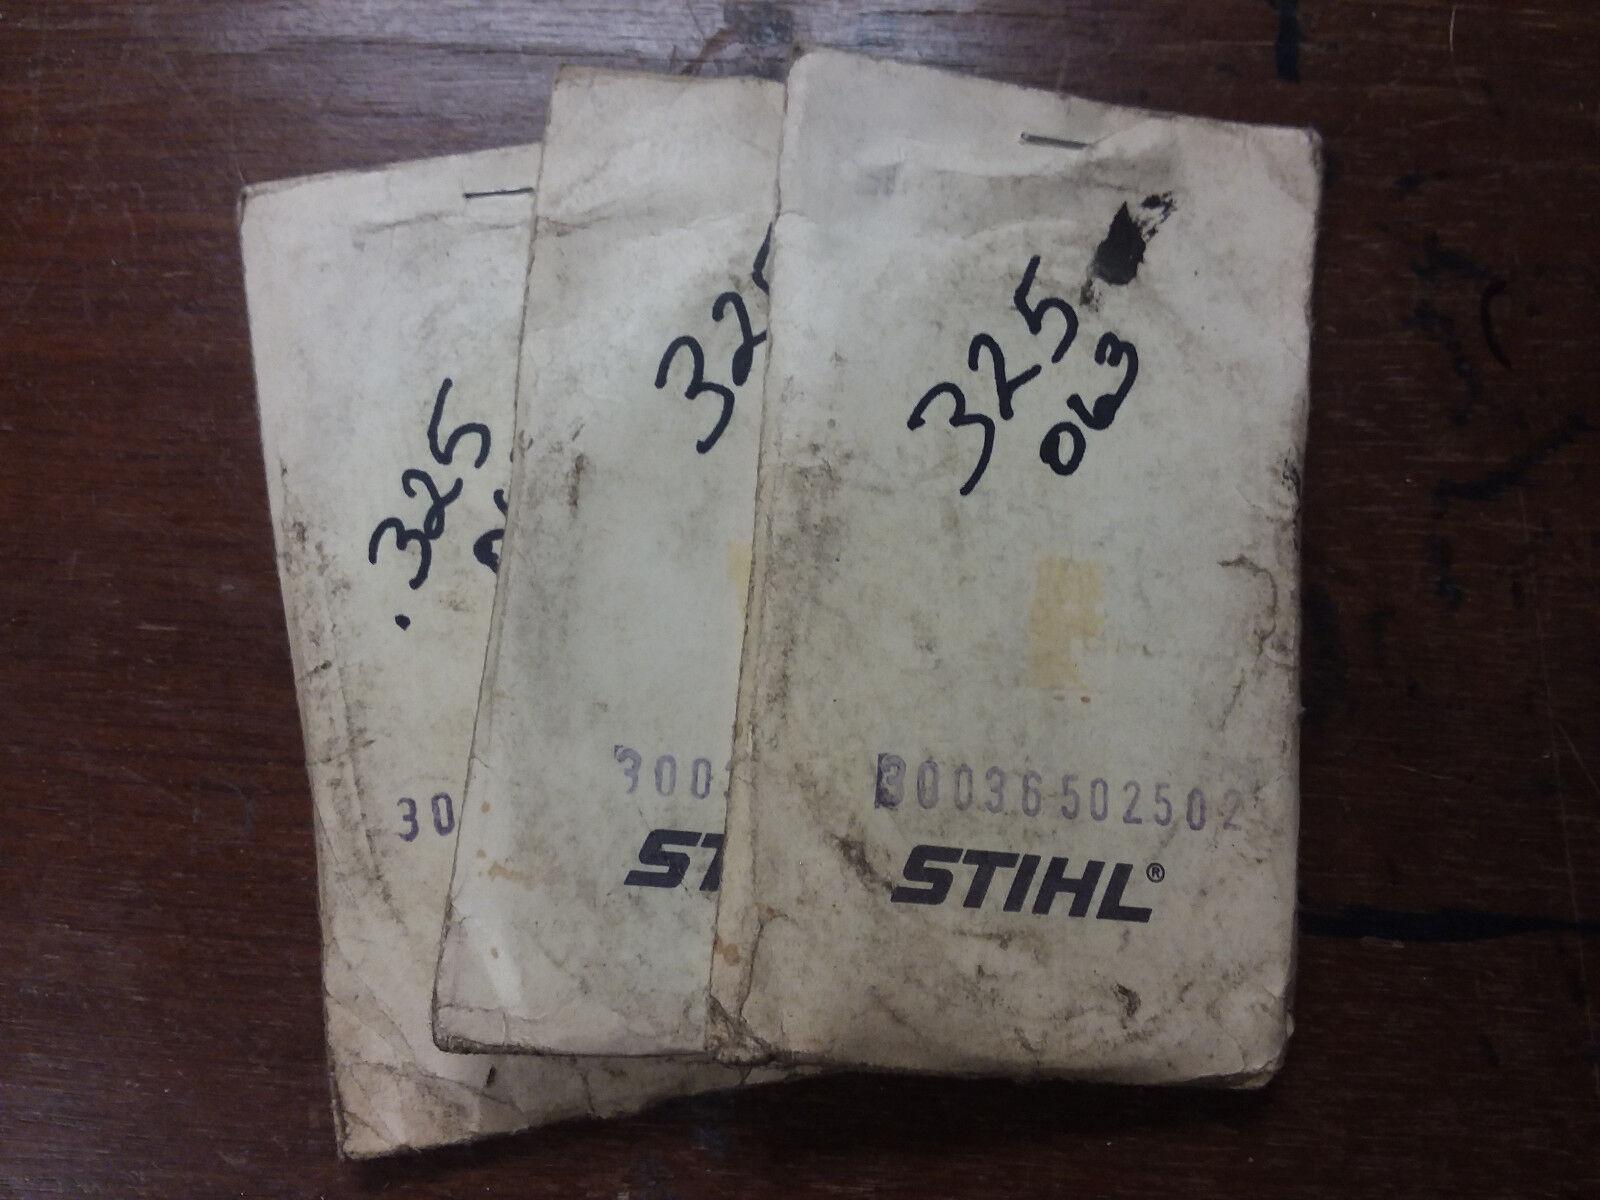 (3) NOS Stihl Bar Sprocket Part   3003-650-2502